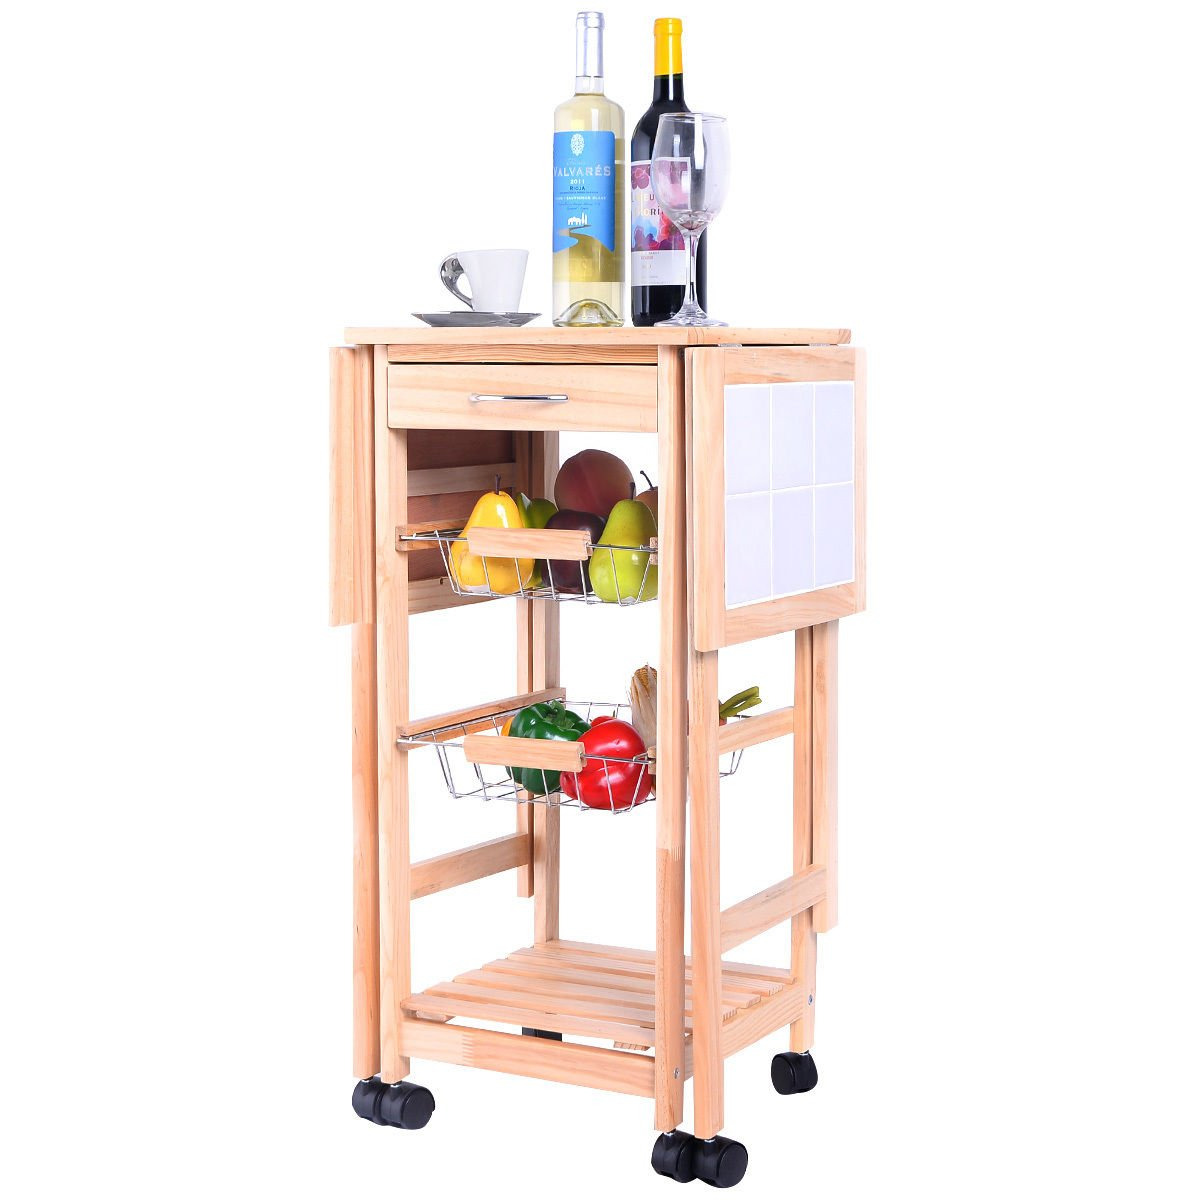 PROSPERLY U.S.Product Portable Rolling Wood Kitchen Trolley Cart Drop Leaf Storage Drawers Rack Basket by Prosperly (Image #4)